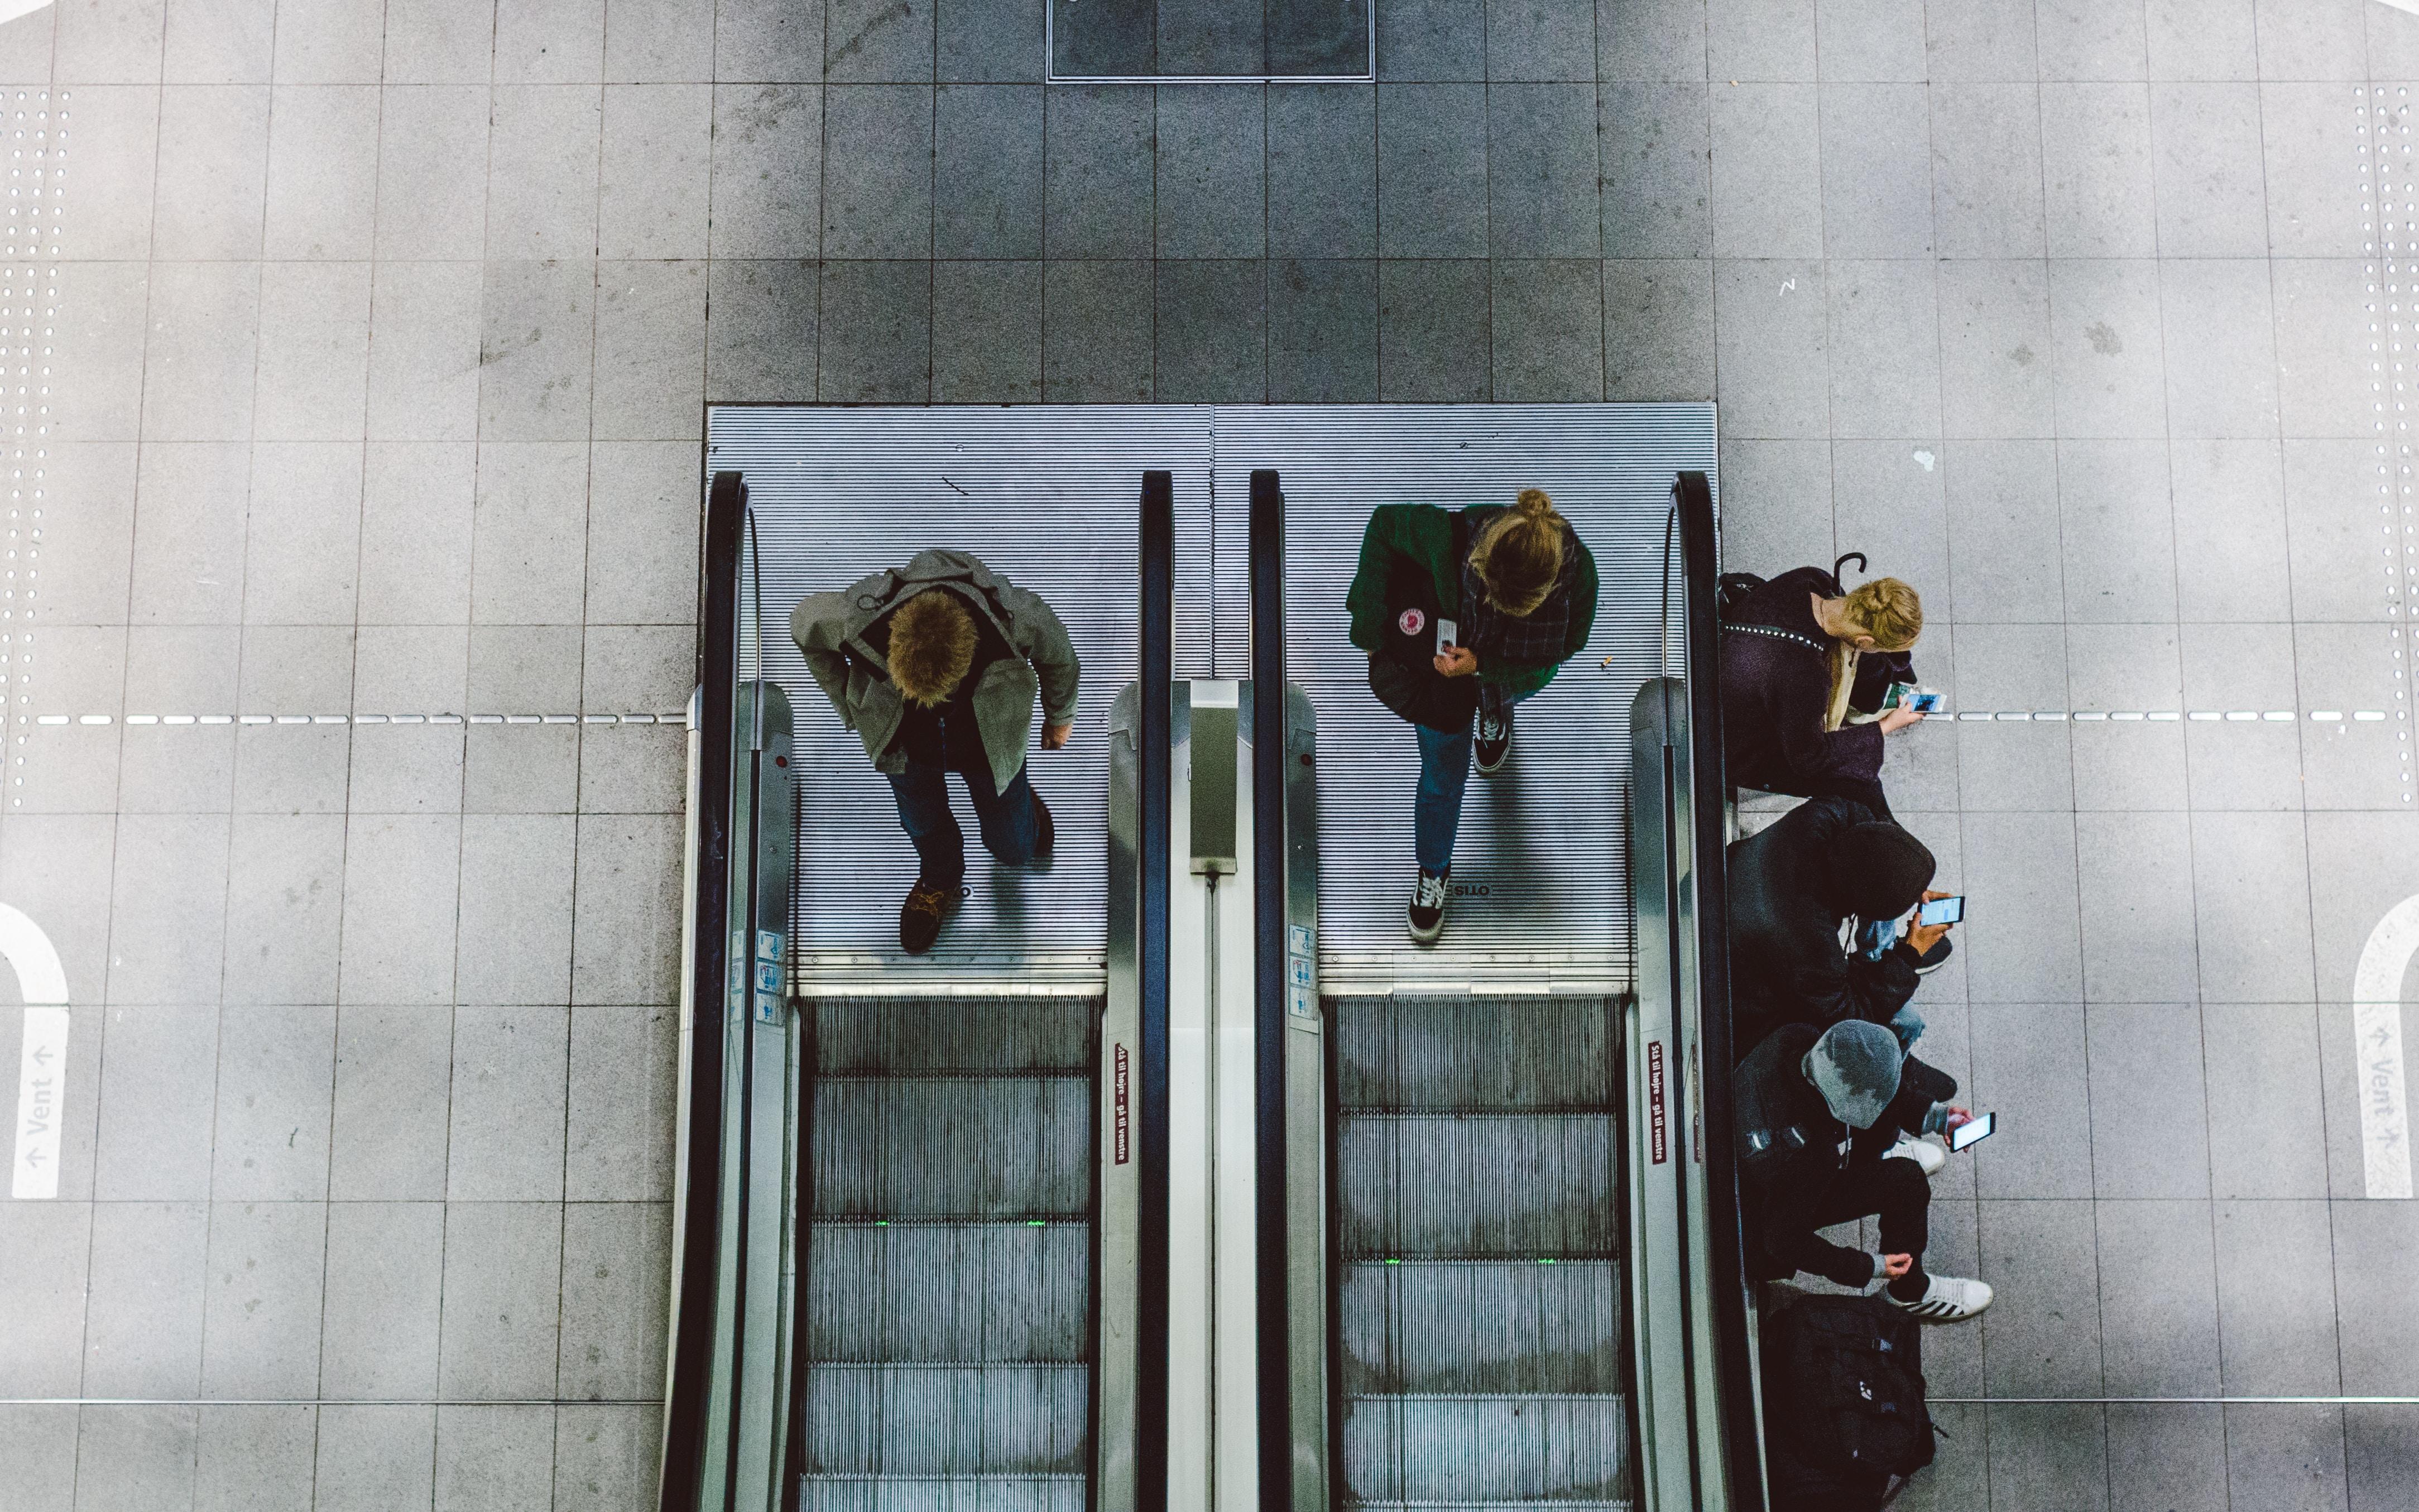 bird's-eye view of escalator